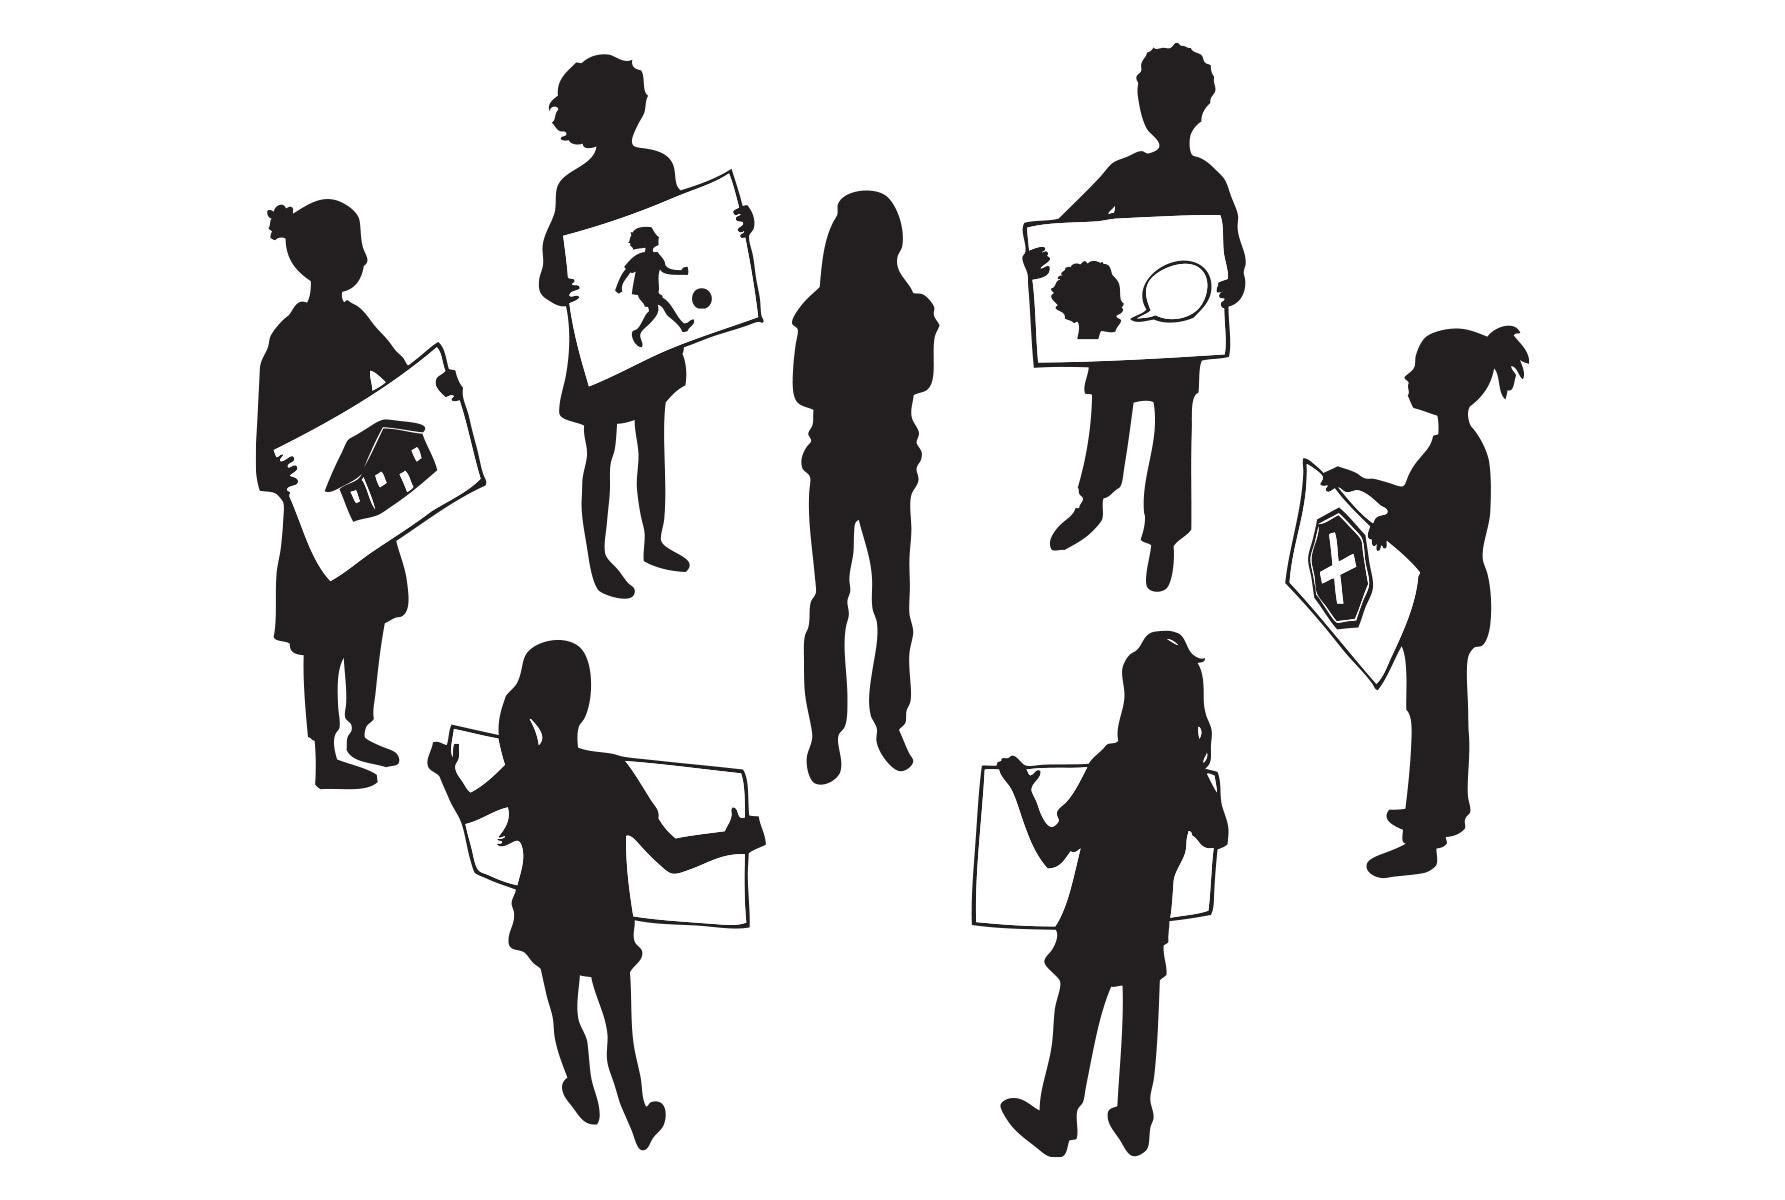 Street Children Illustration